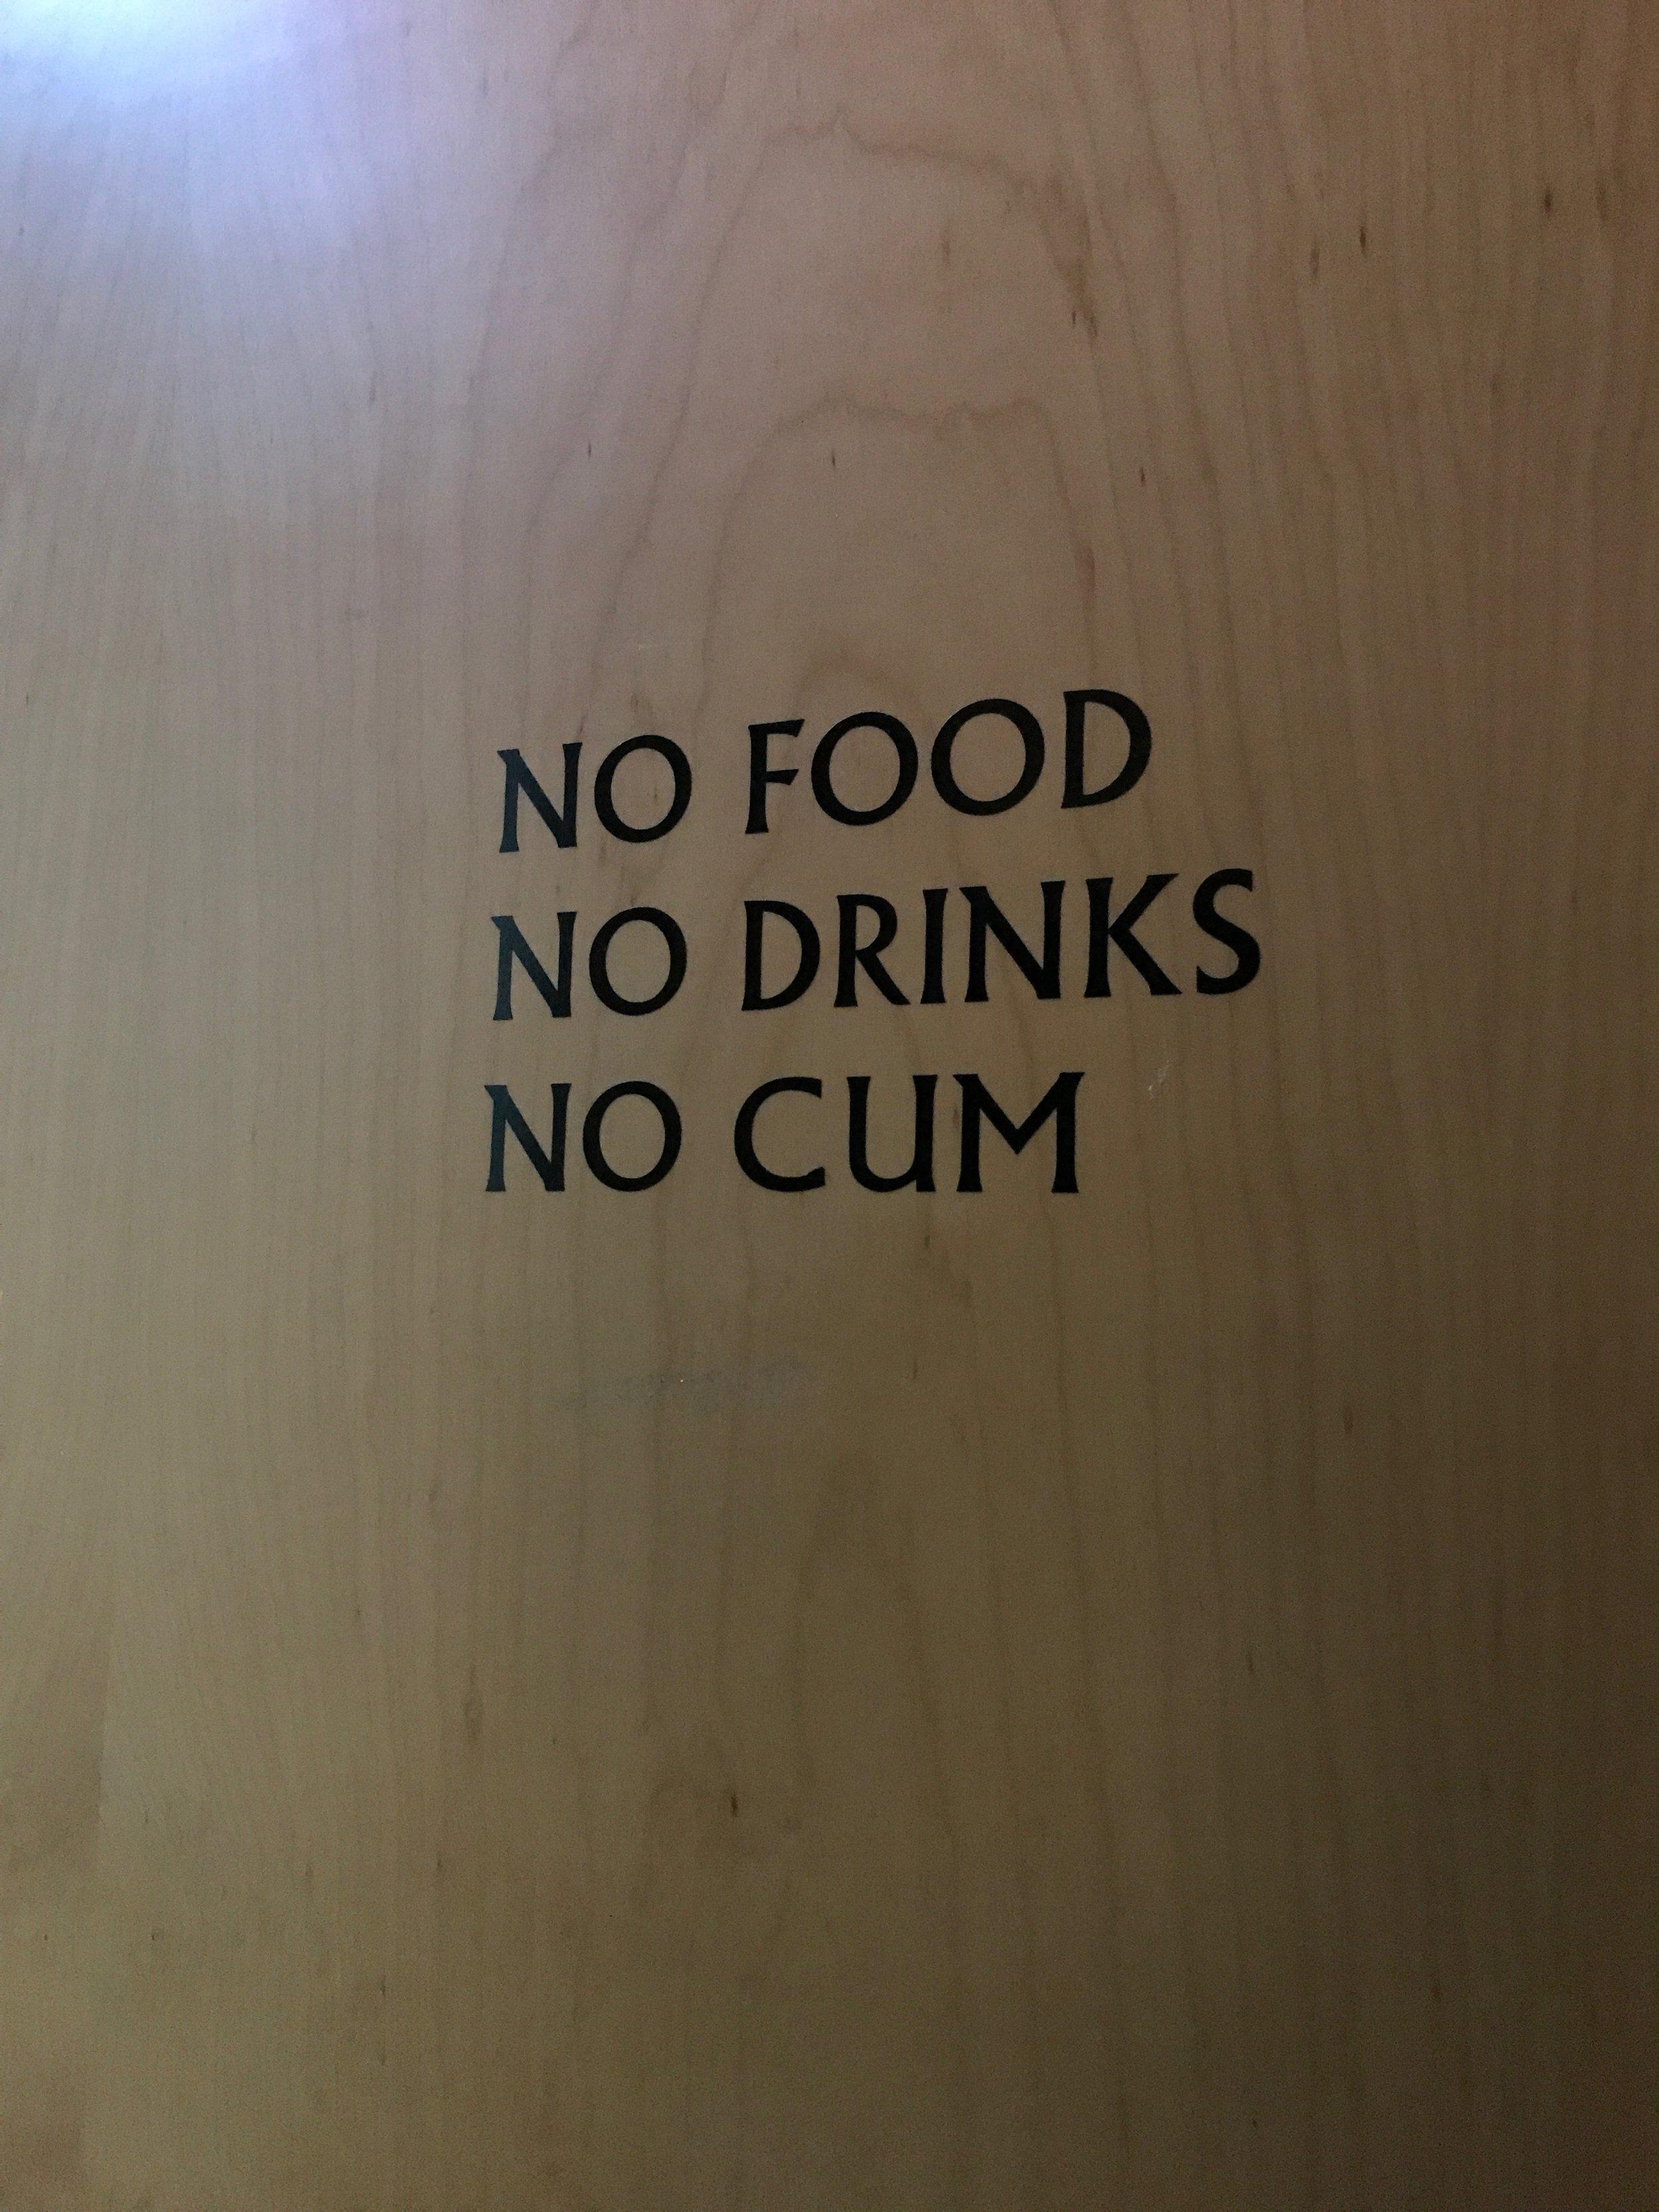 No food......No drinks.....No wonder....